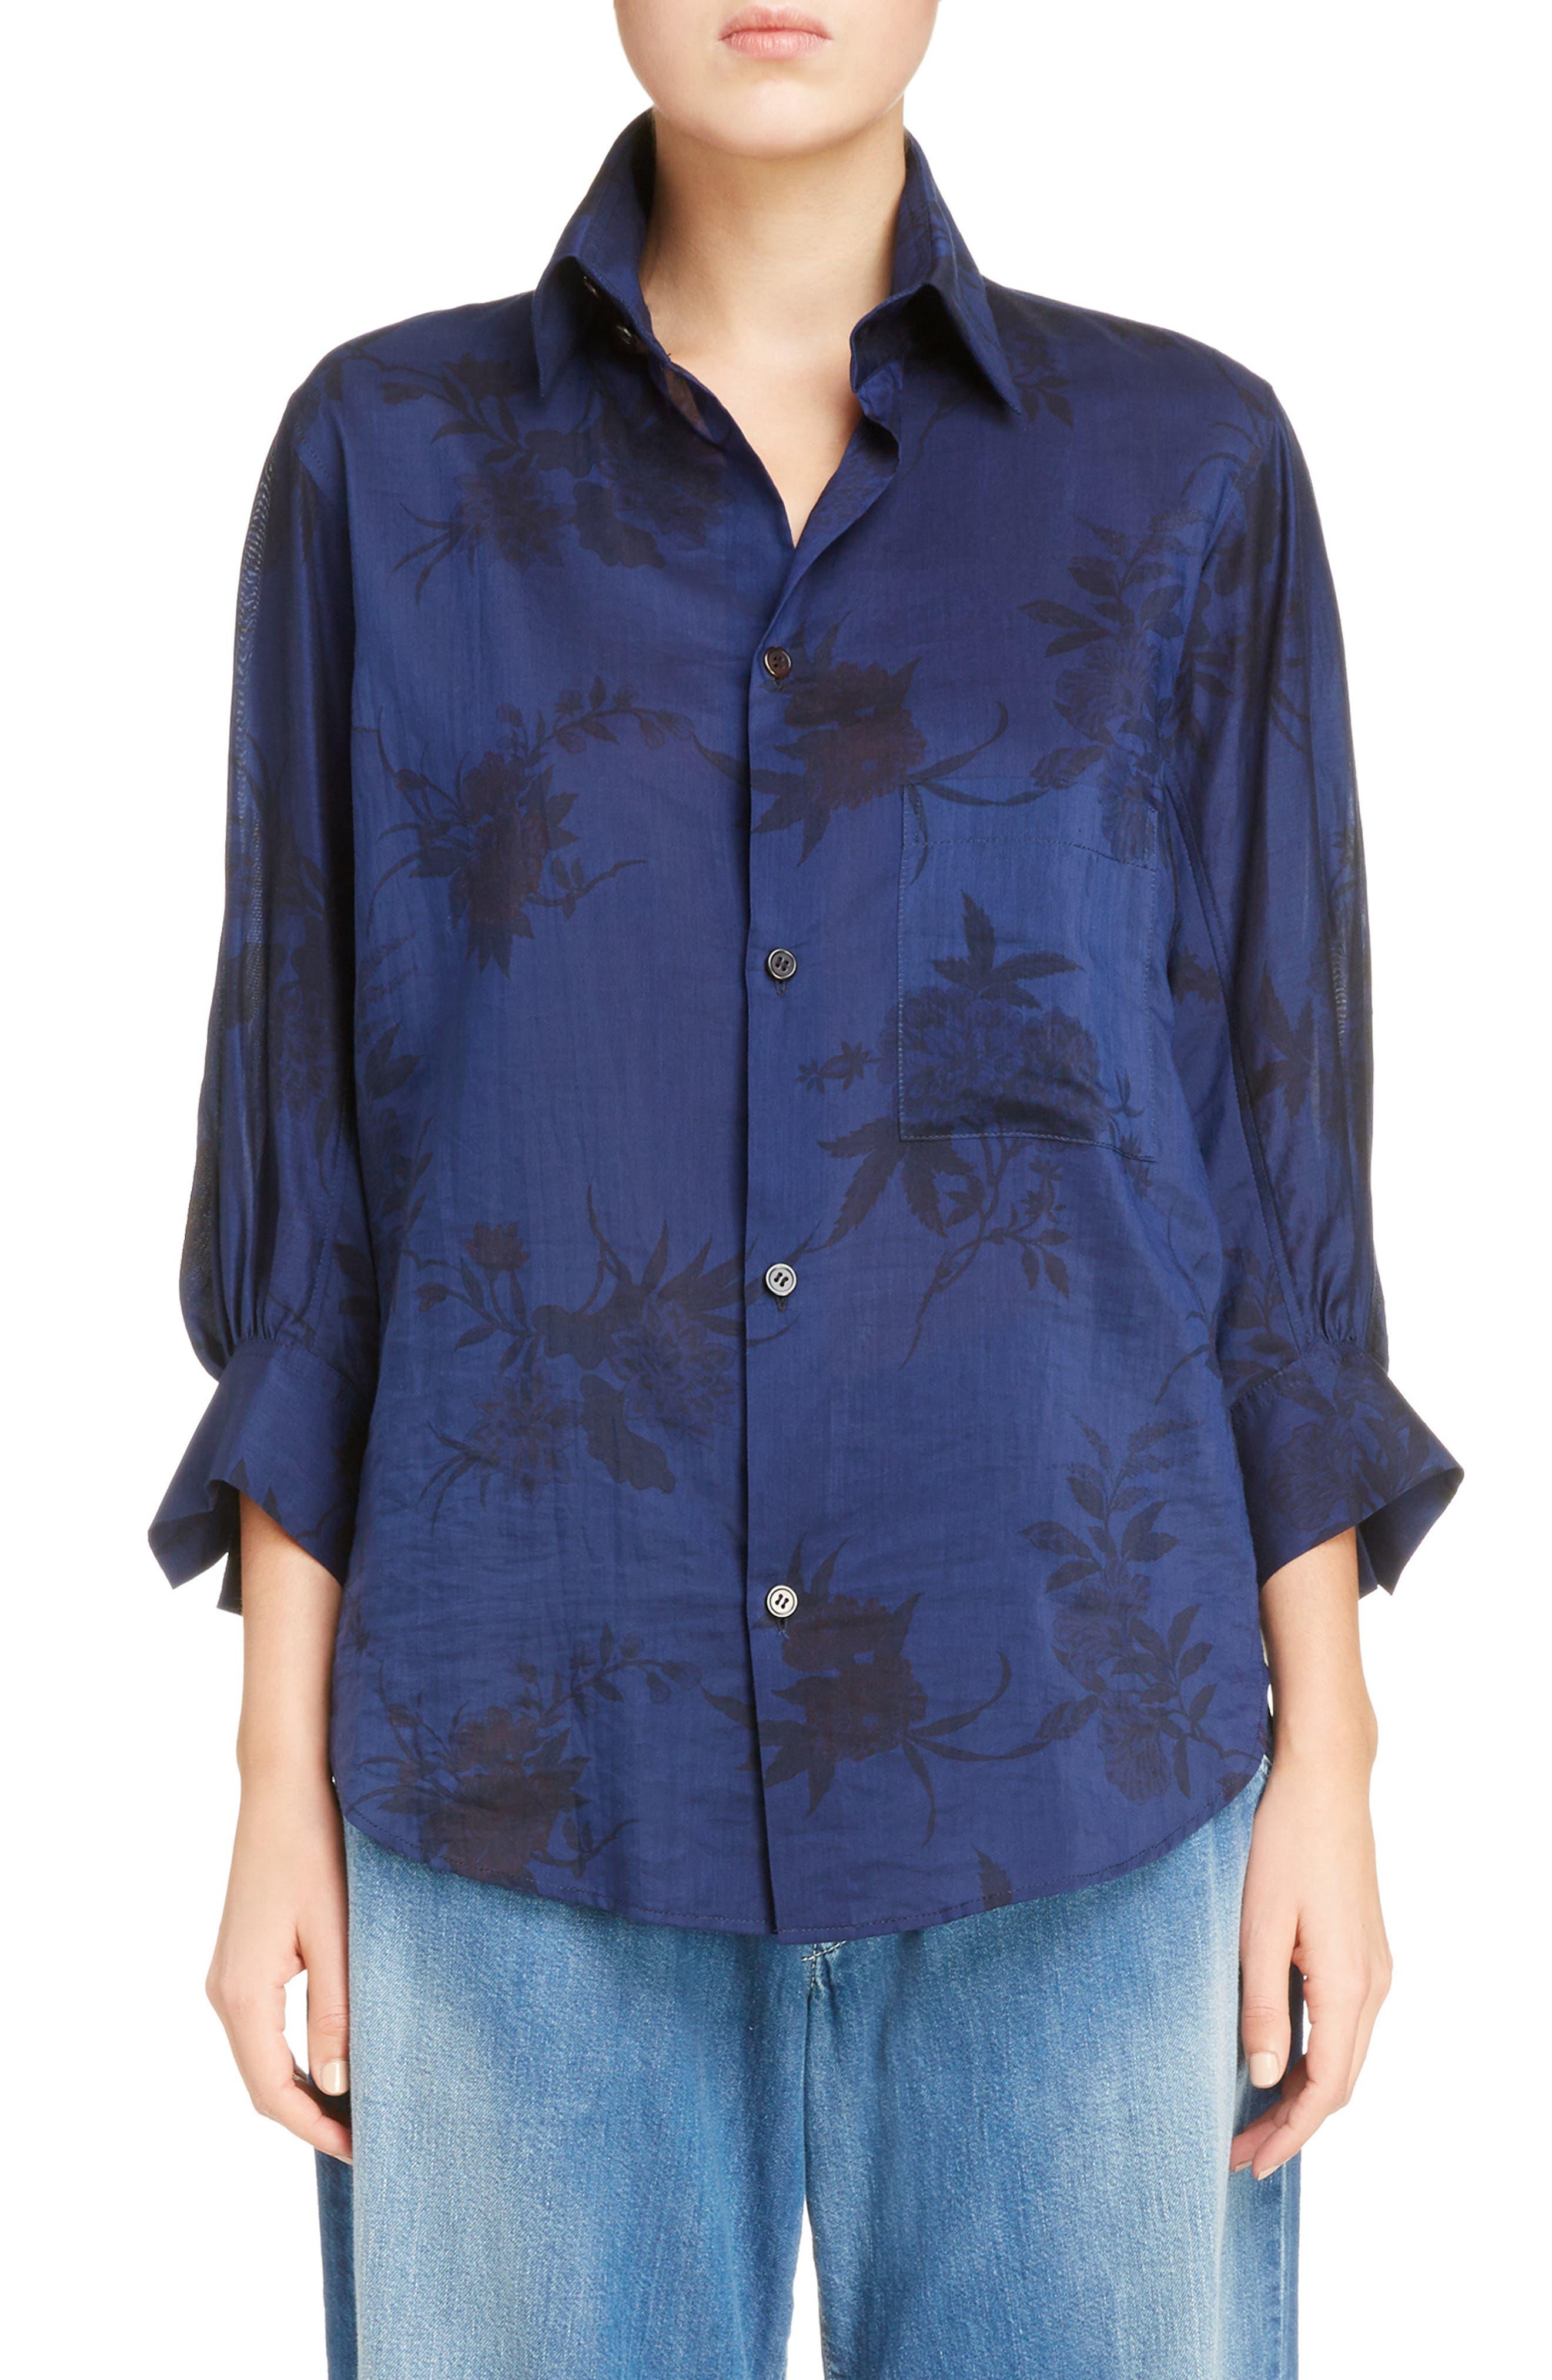 Alternate Image 1 Selected - Y's by Yohji Yamamoto Floral Print Shirt